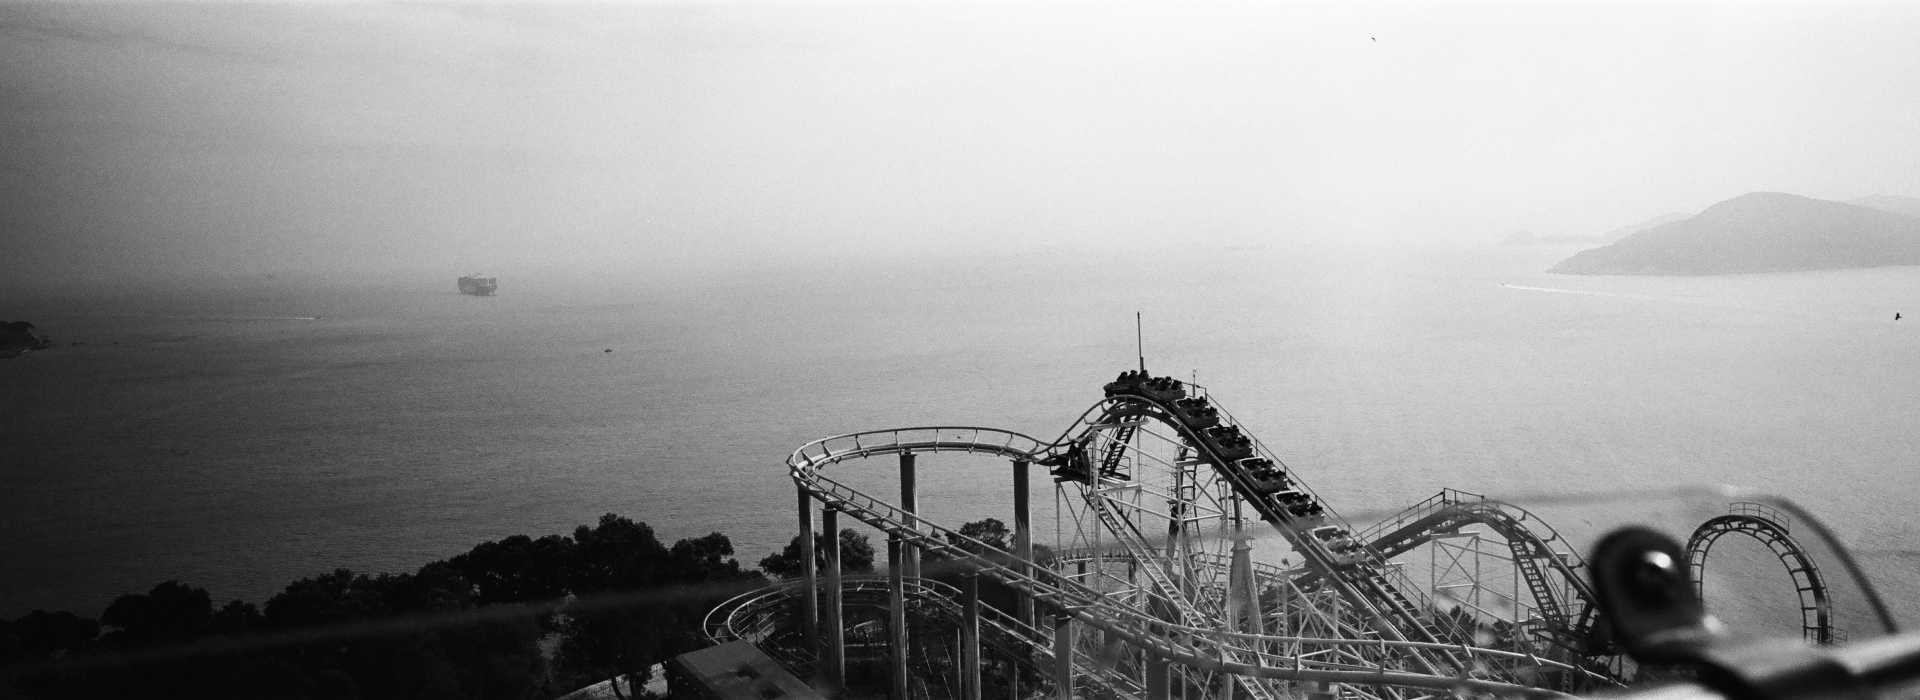 """The Dragon"" Rollercoaster Ocean Park, Hong Kong. 2014"